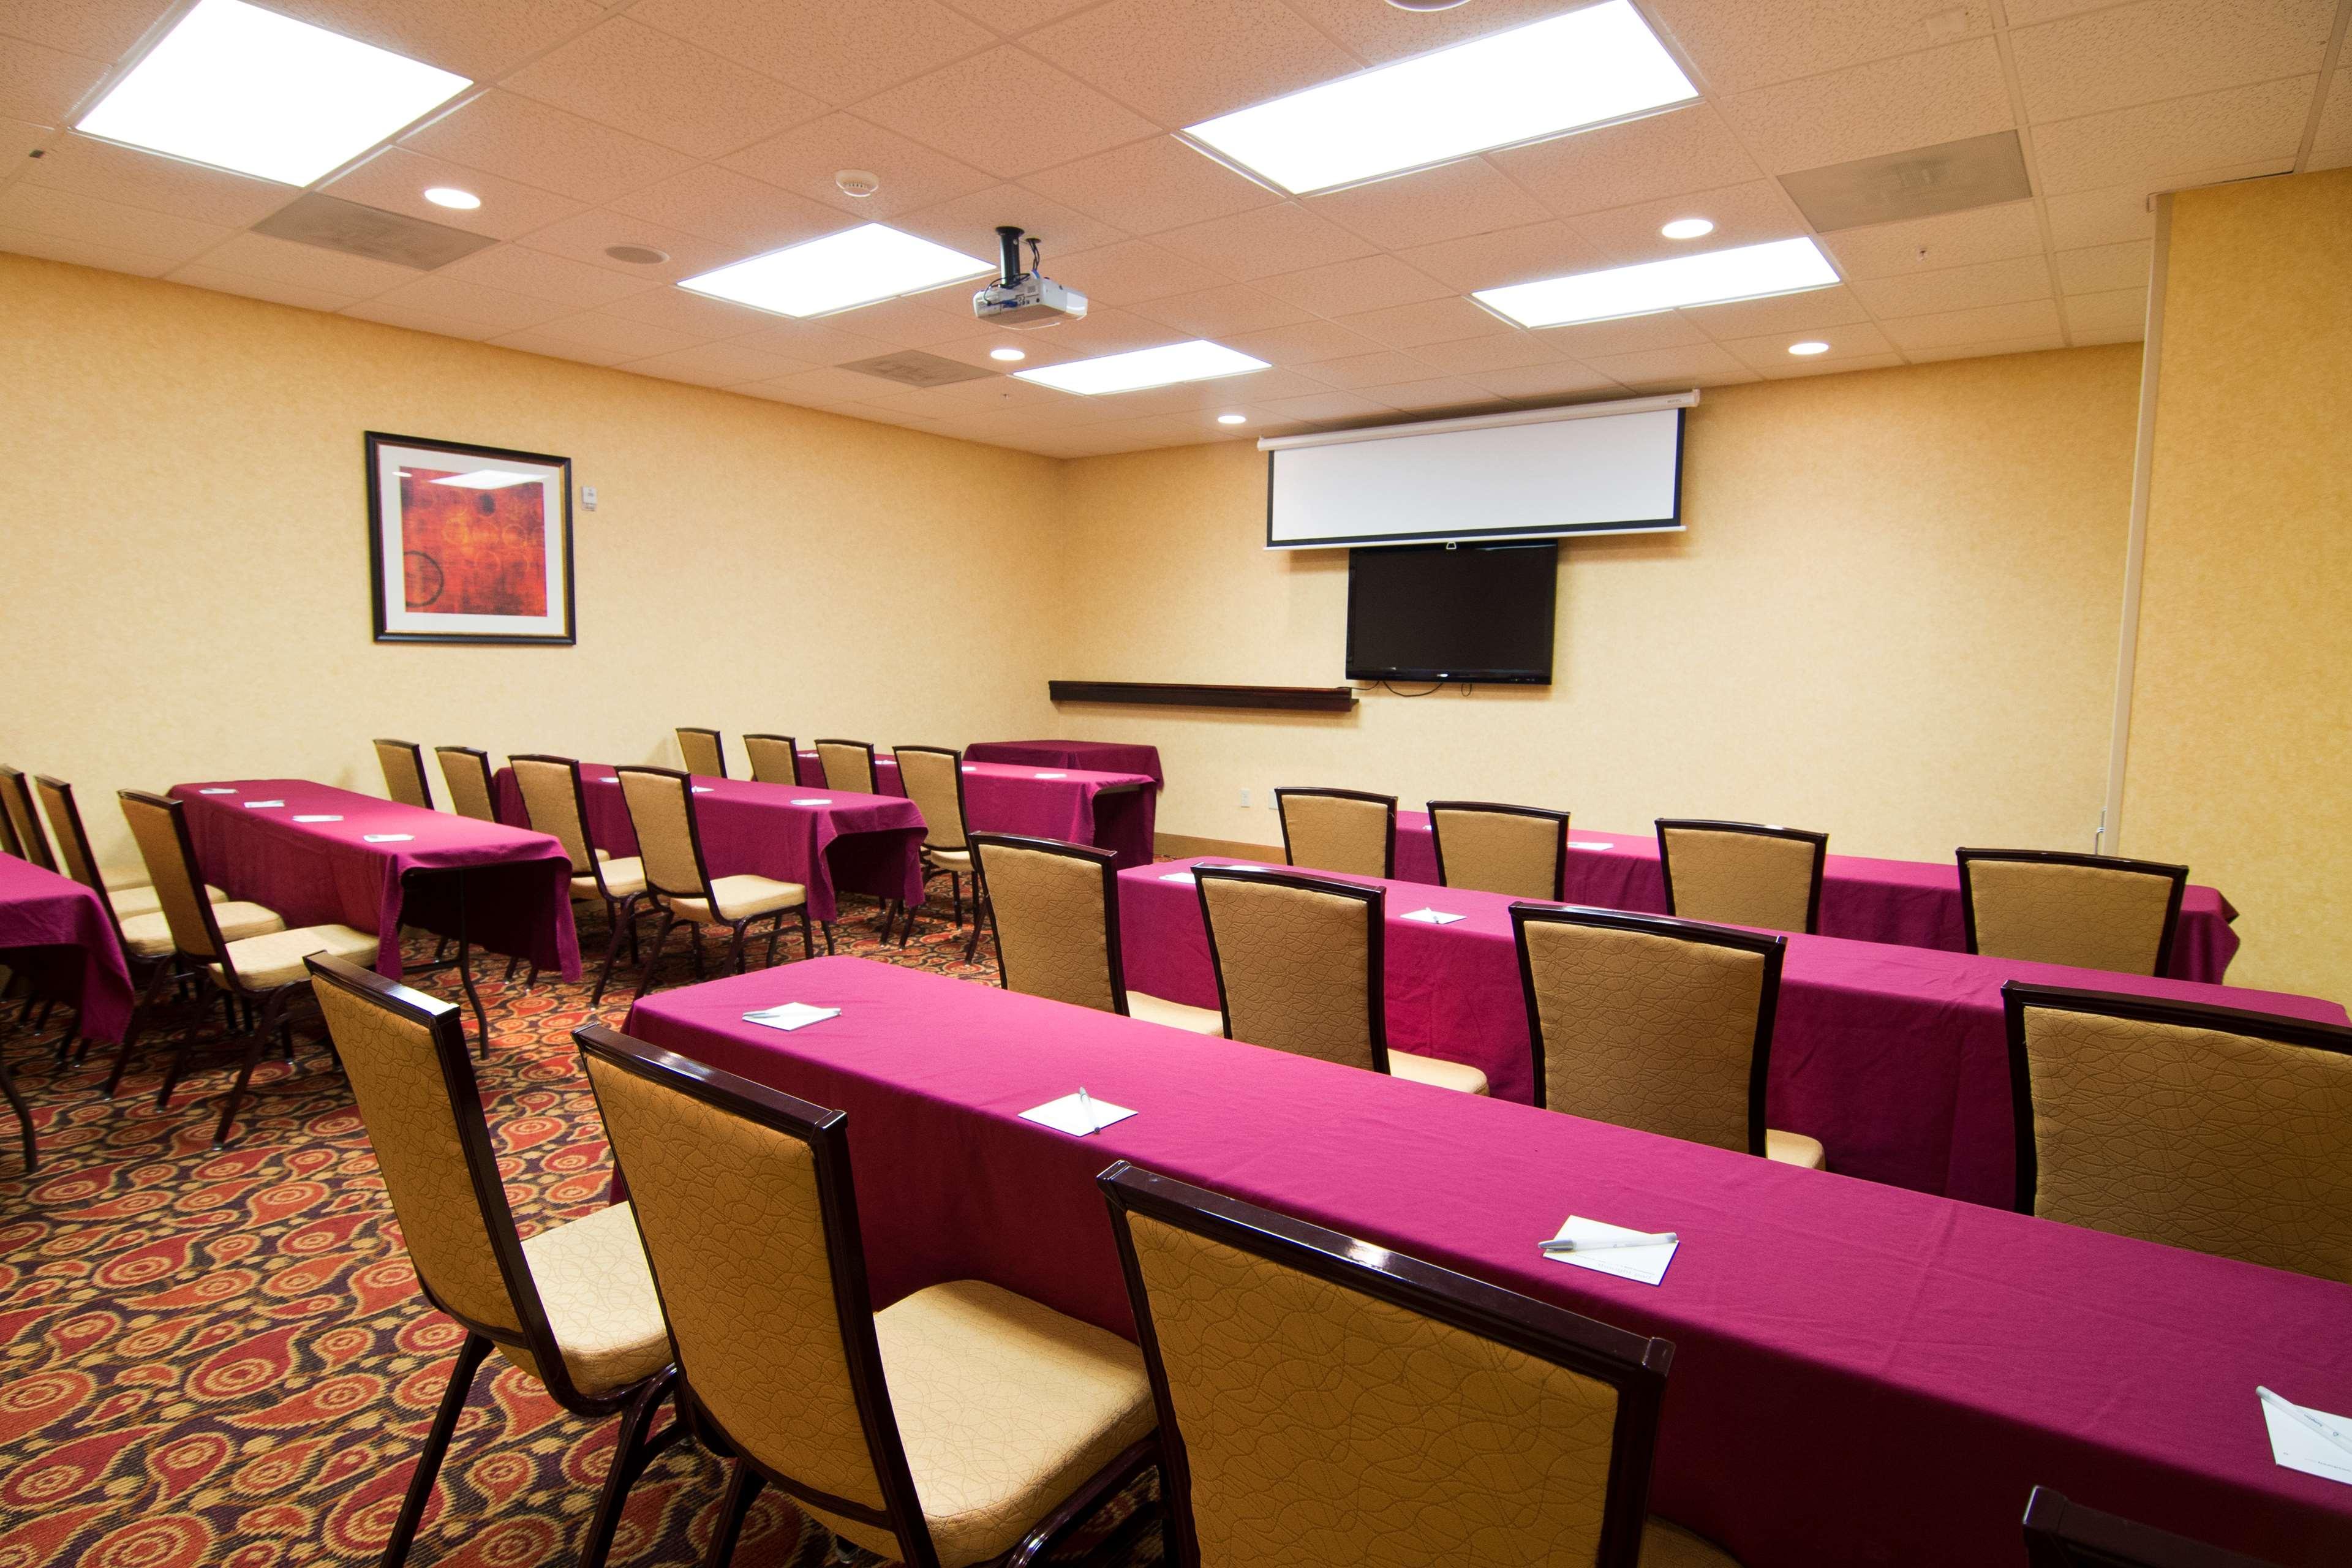 Hampton Inn & Suites Orlando Intl Dr N image 20